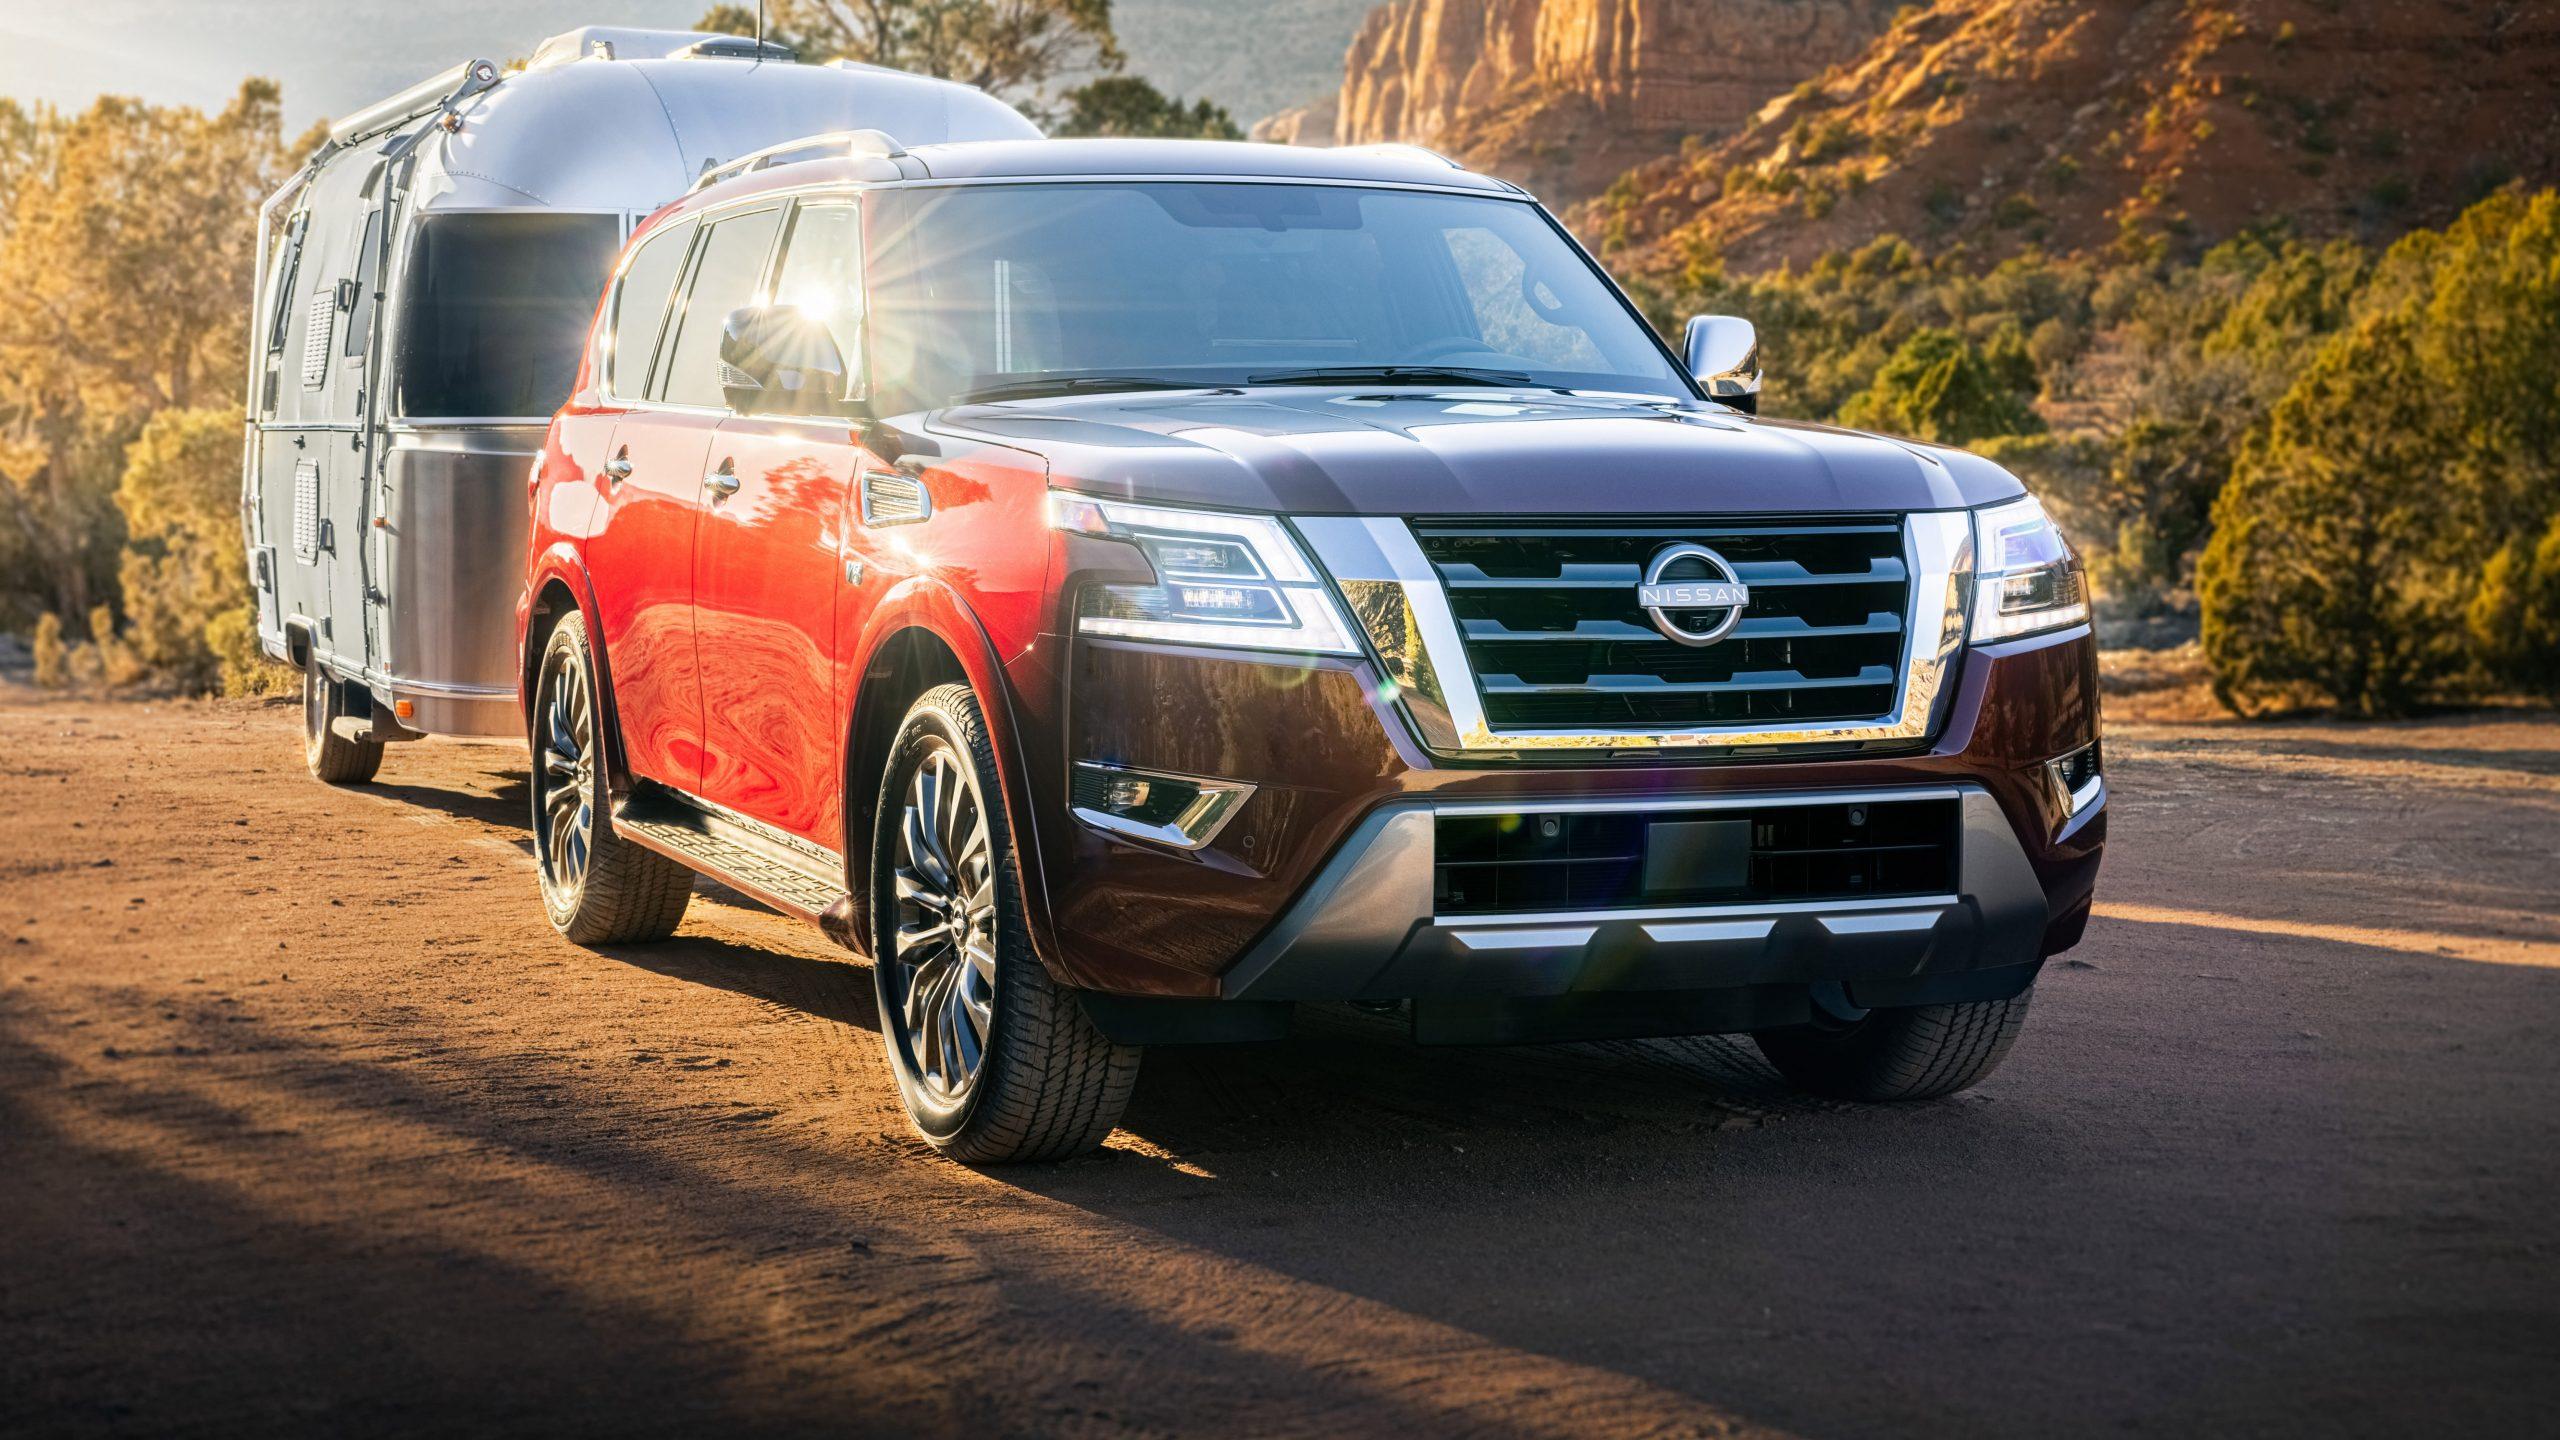 4 Nissan Patrol facelift unveiled – UPDATE: Australian arrival - Nissan Patrol Facelift 2021